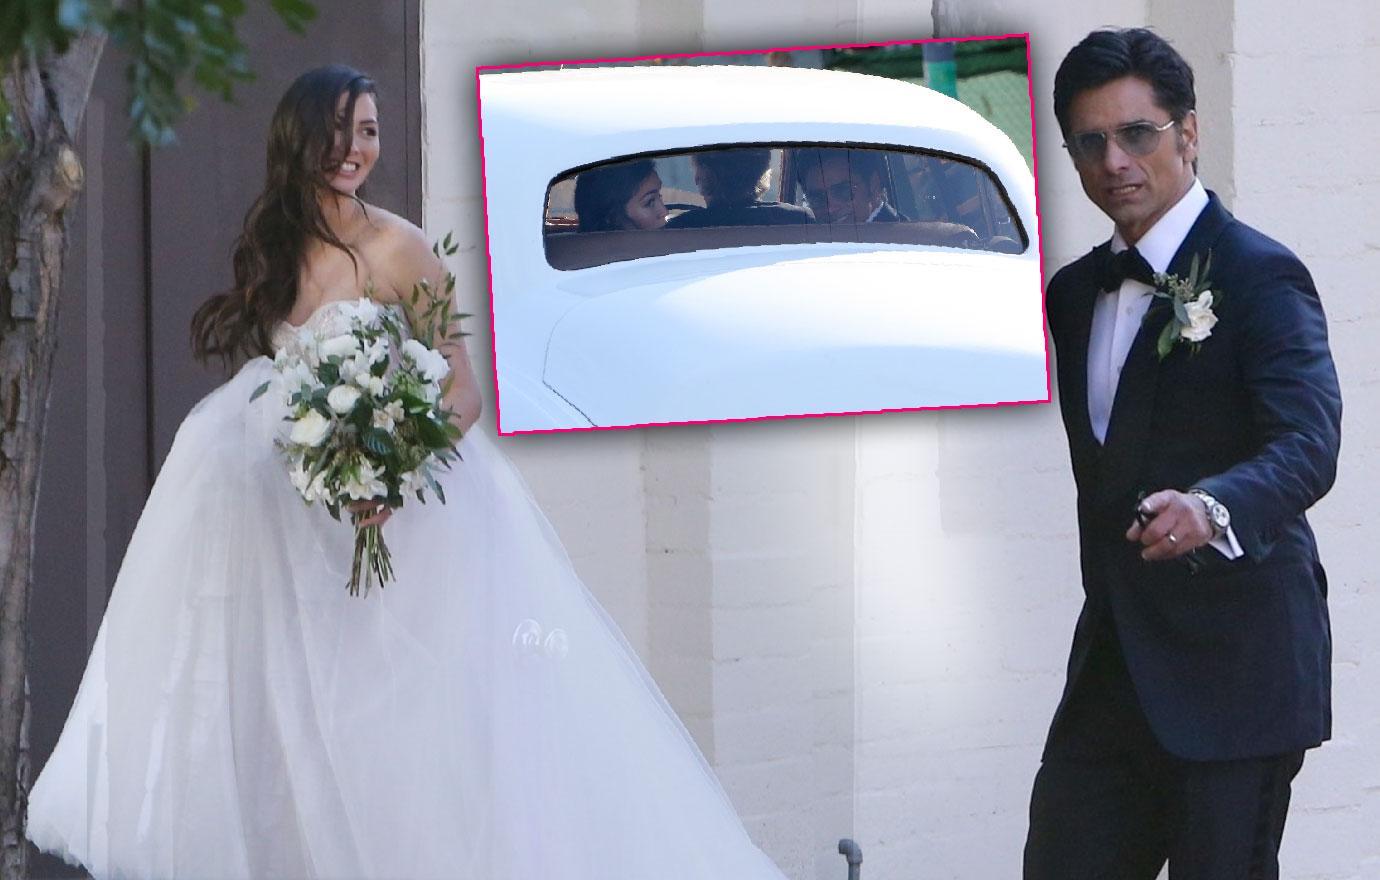 John Stamos Wedding Gallery